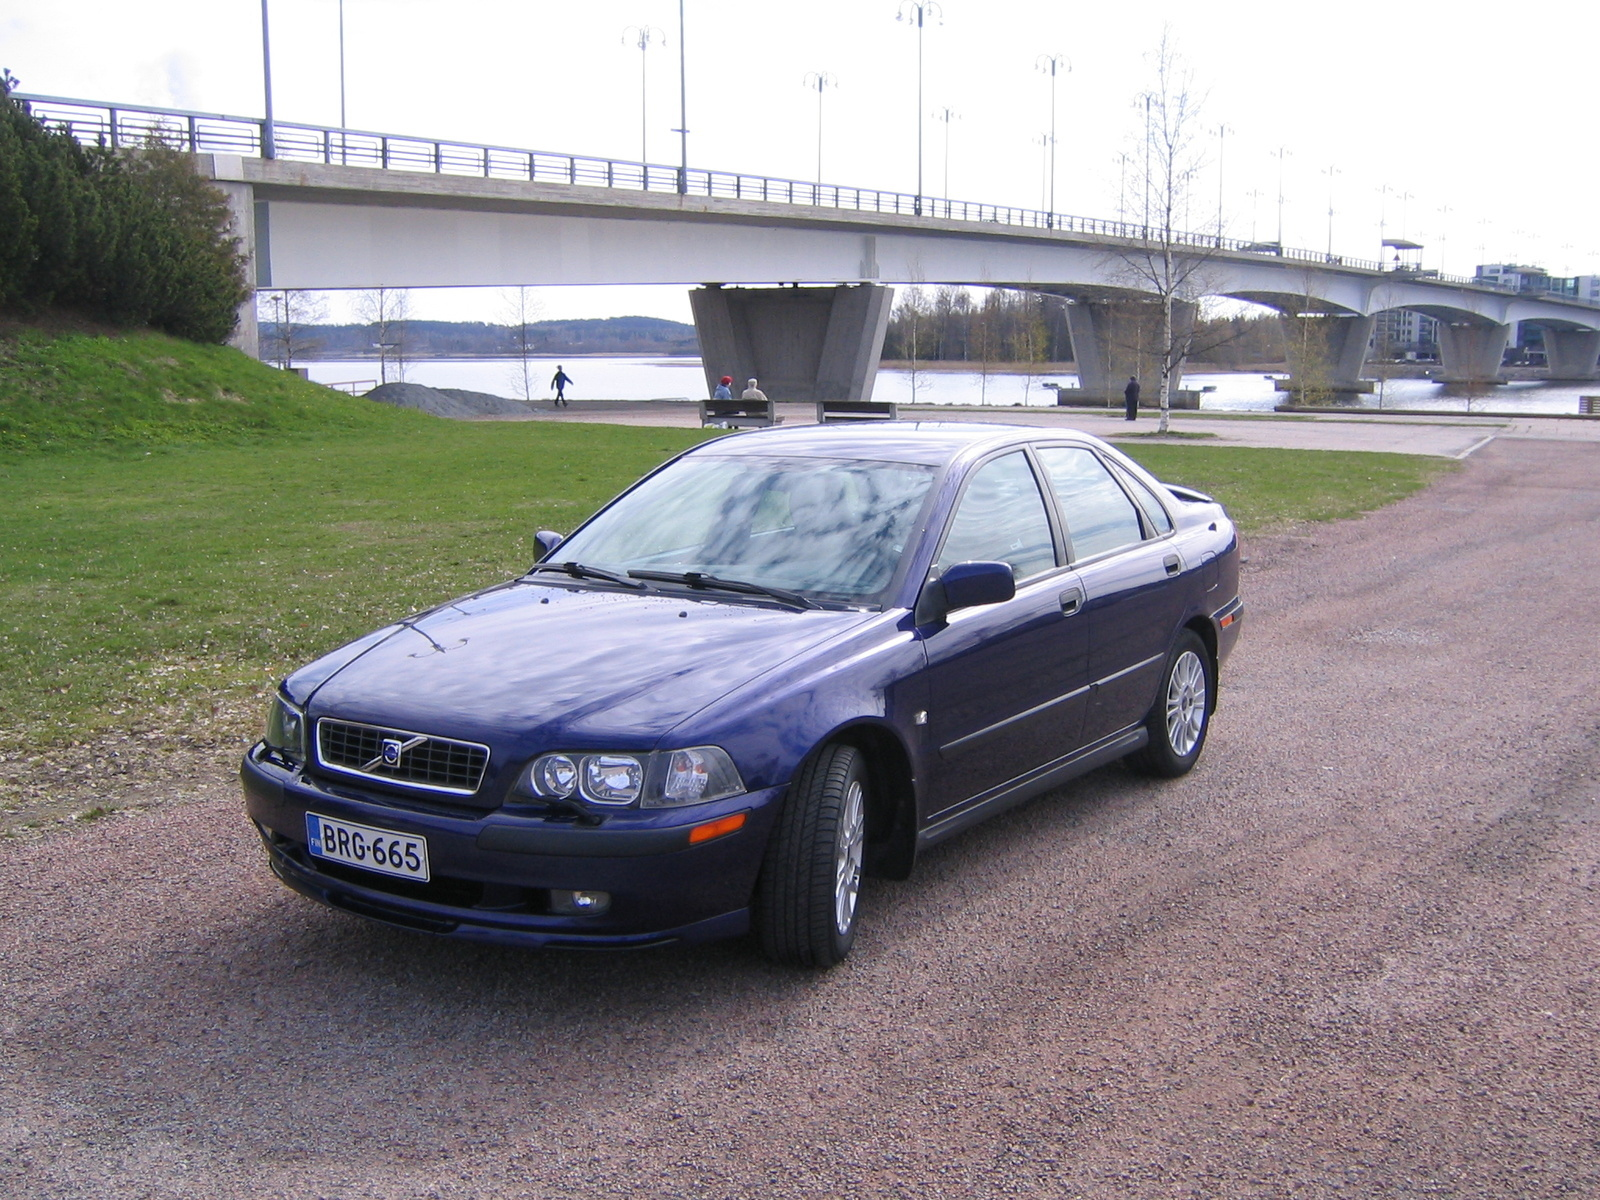 2002 Volvo S40 - Overview - CarGurus